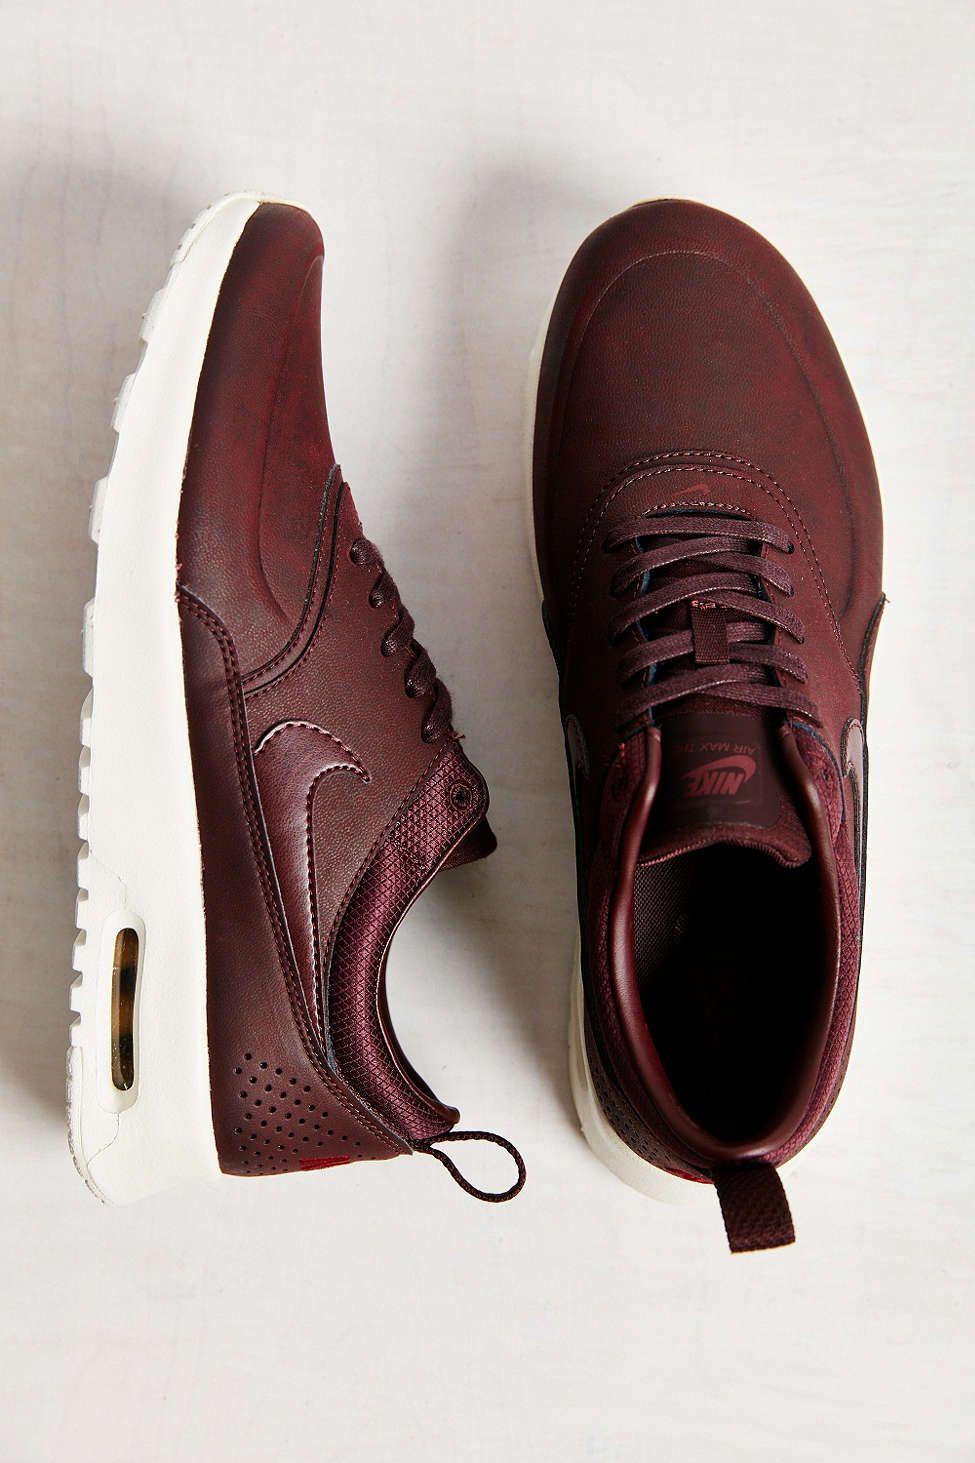 Nike Air Max Thea Premium Sneaker Urban Outfitters | Лайки